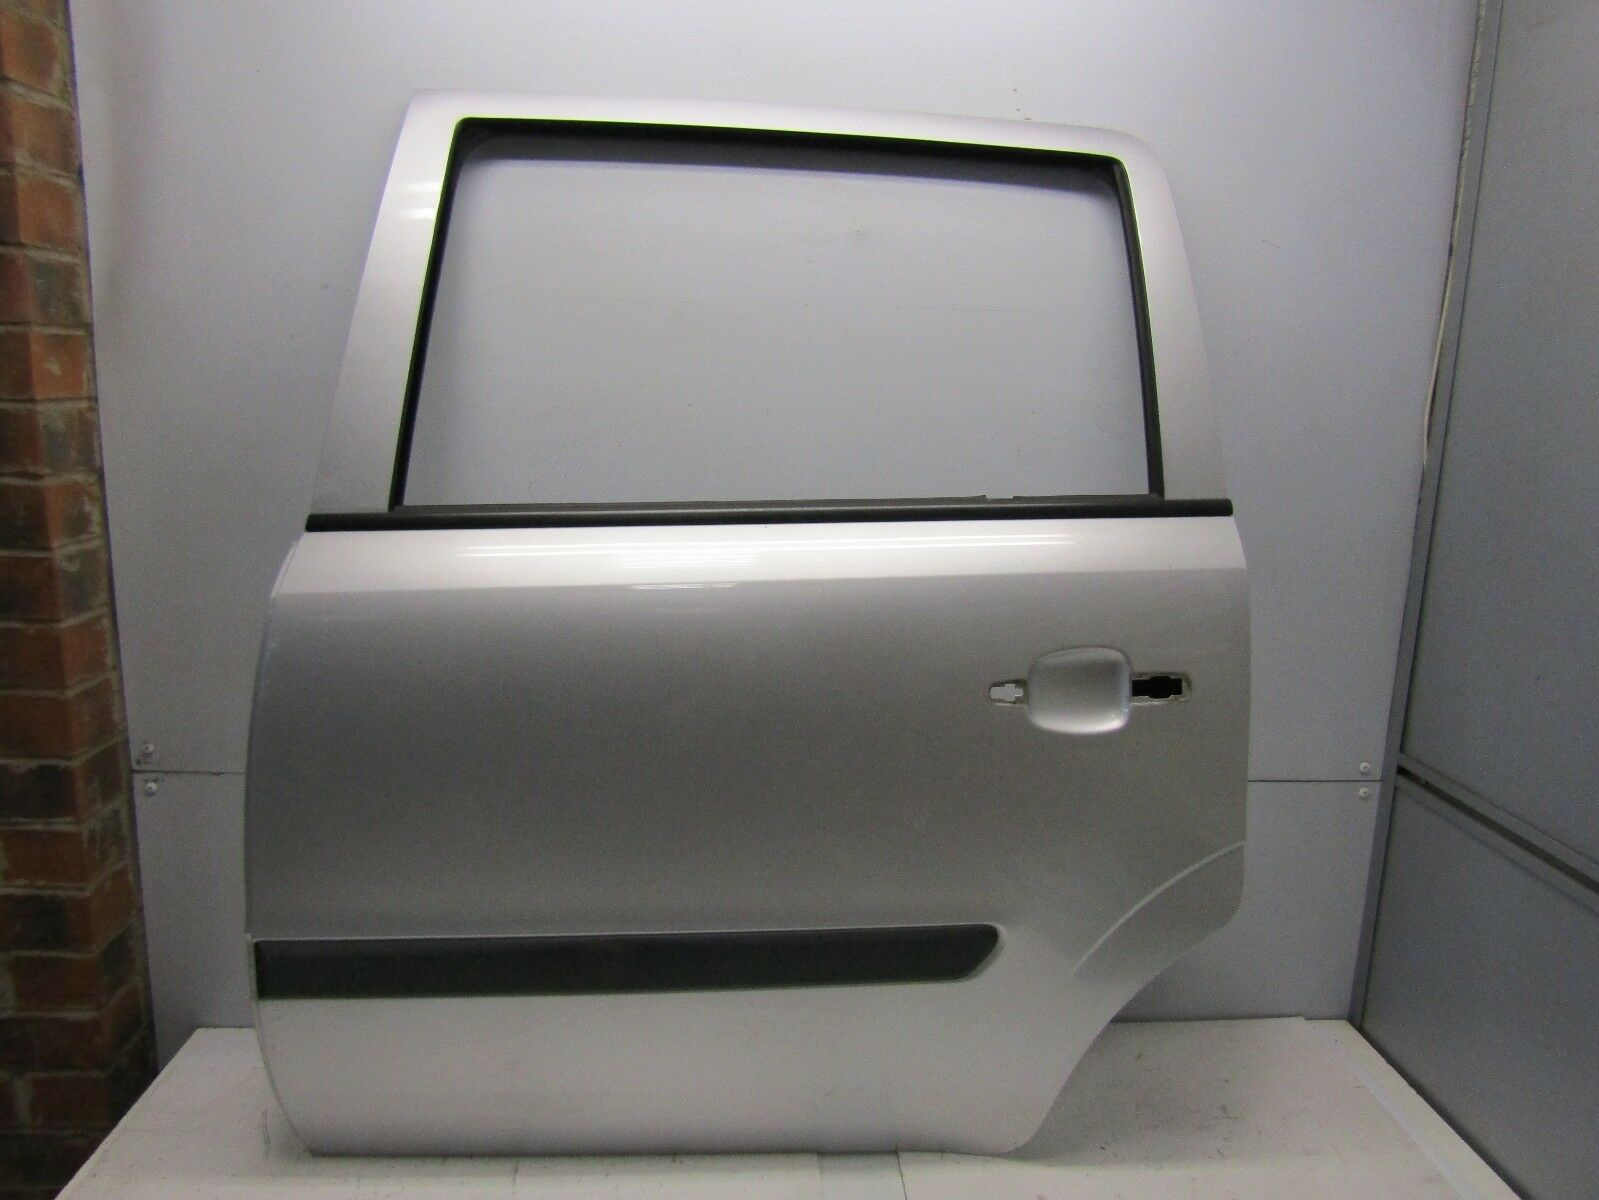 VAUXHALL ZAFIRA B 2005-11 NEARSIDE/LEFT REAR BARE DOOR (Z157 STARSILVER 3) #4082